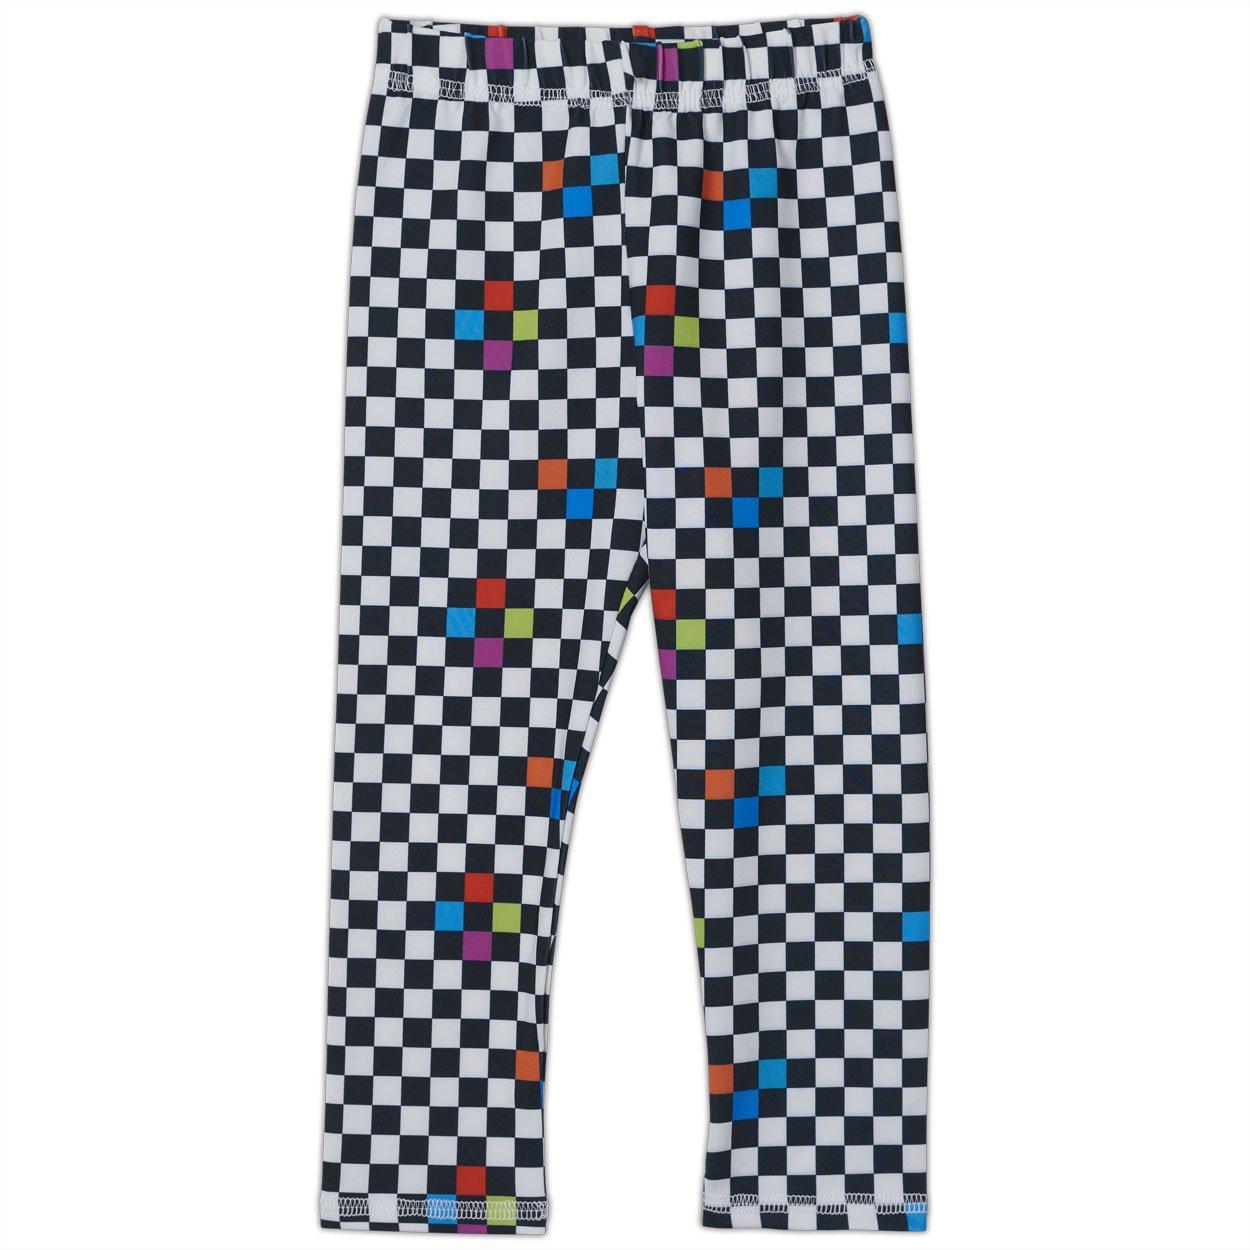 Checkerboard Hybrid Kids Leggings UPF 50+